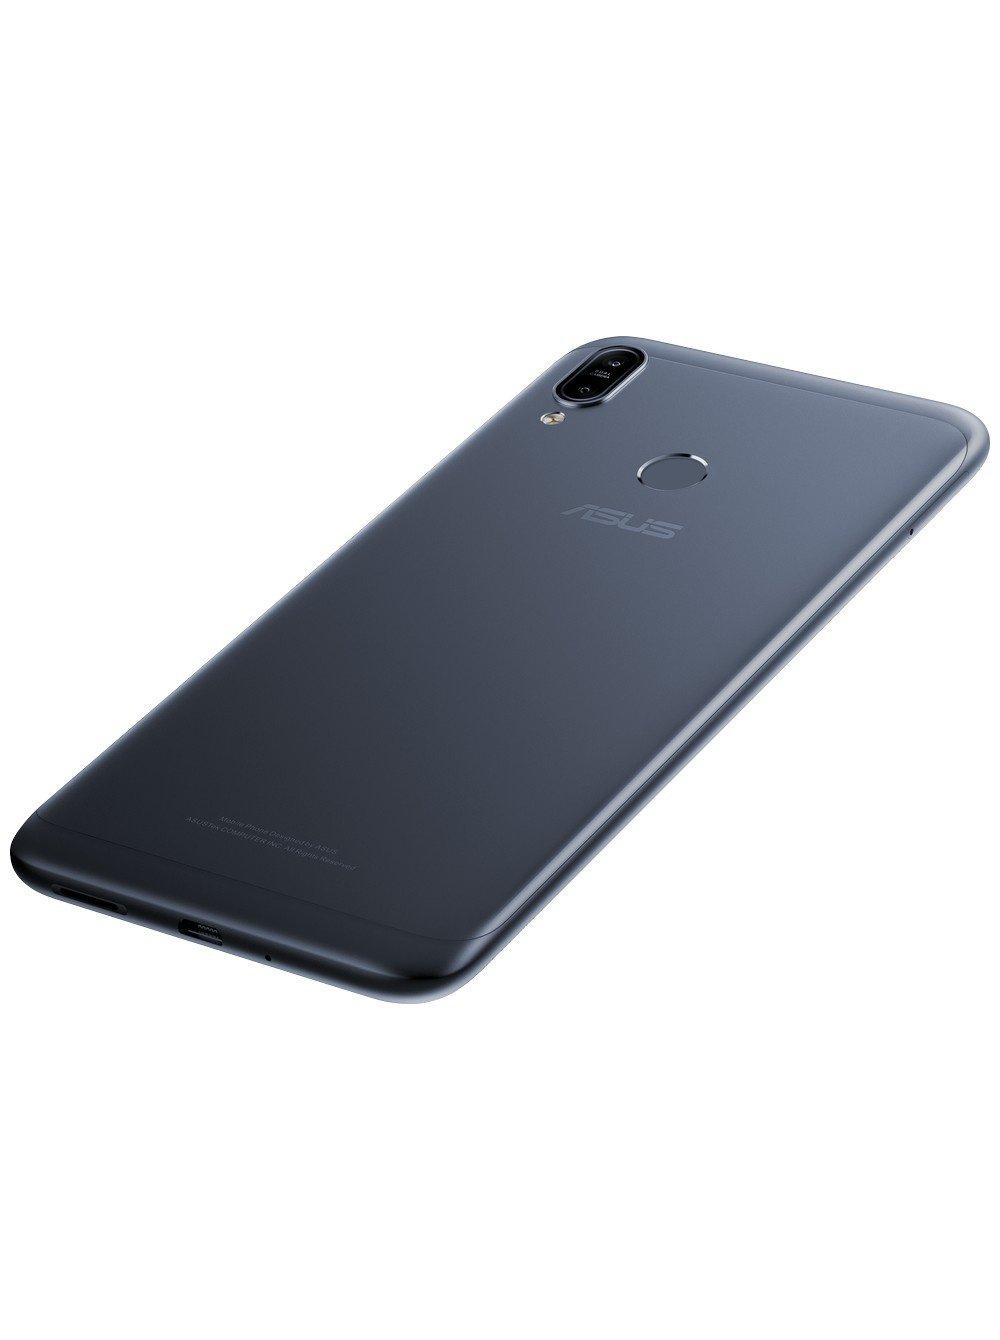 Смартфон Asus ZenFone Max (M2) (ZB633KL-4A070EU) 4/32 GB DUALSIM Black с чехлом фото 13